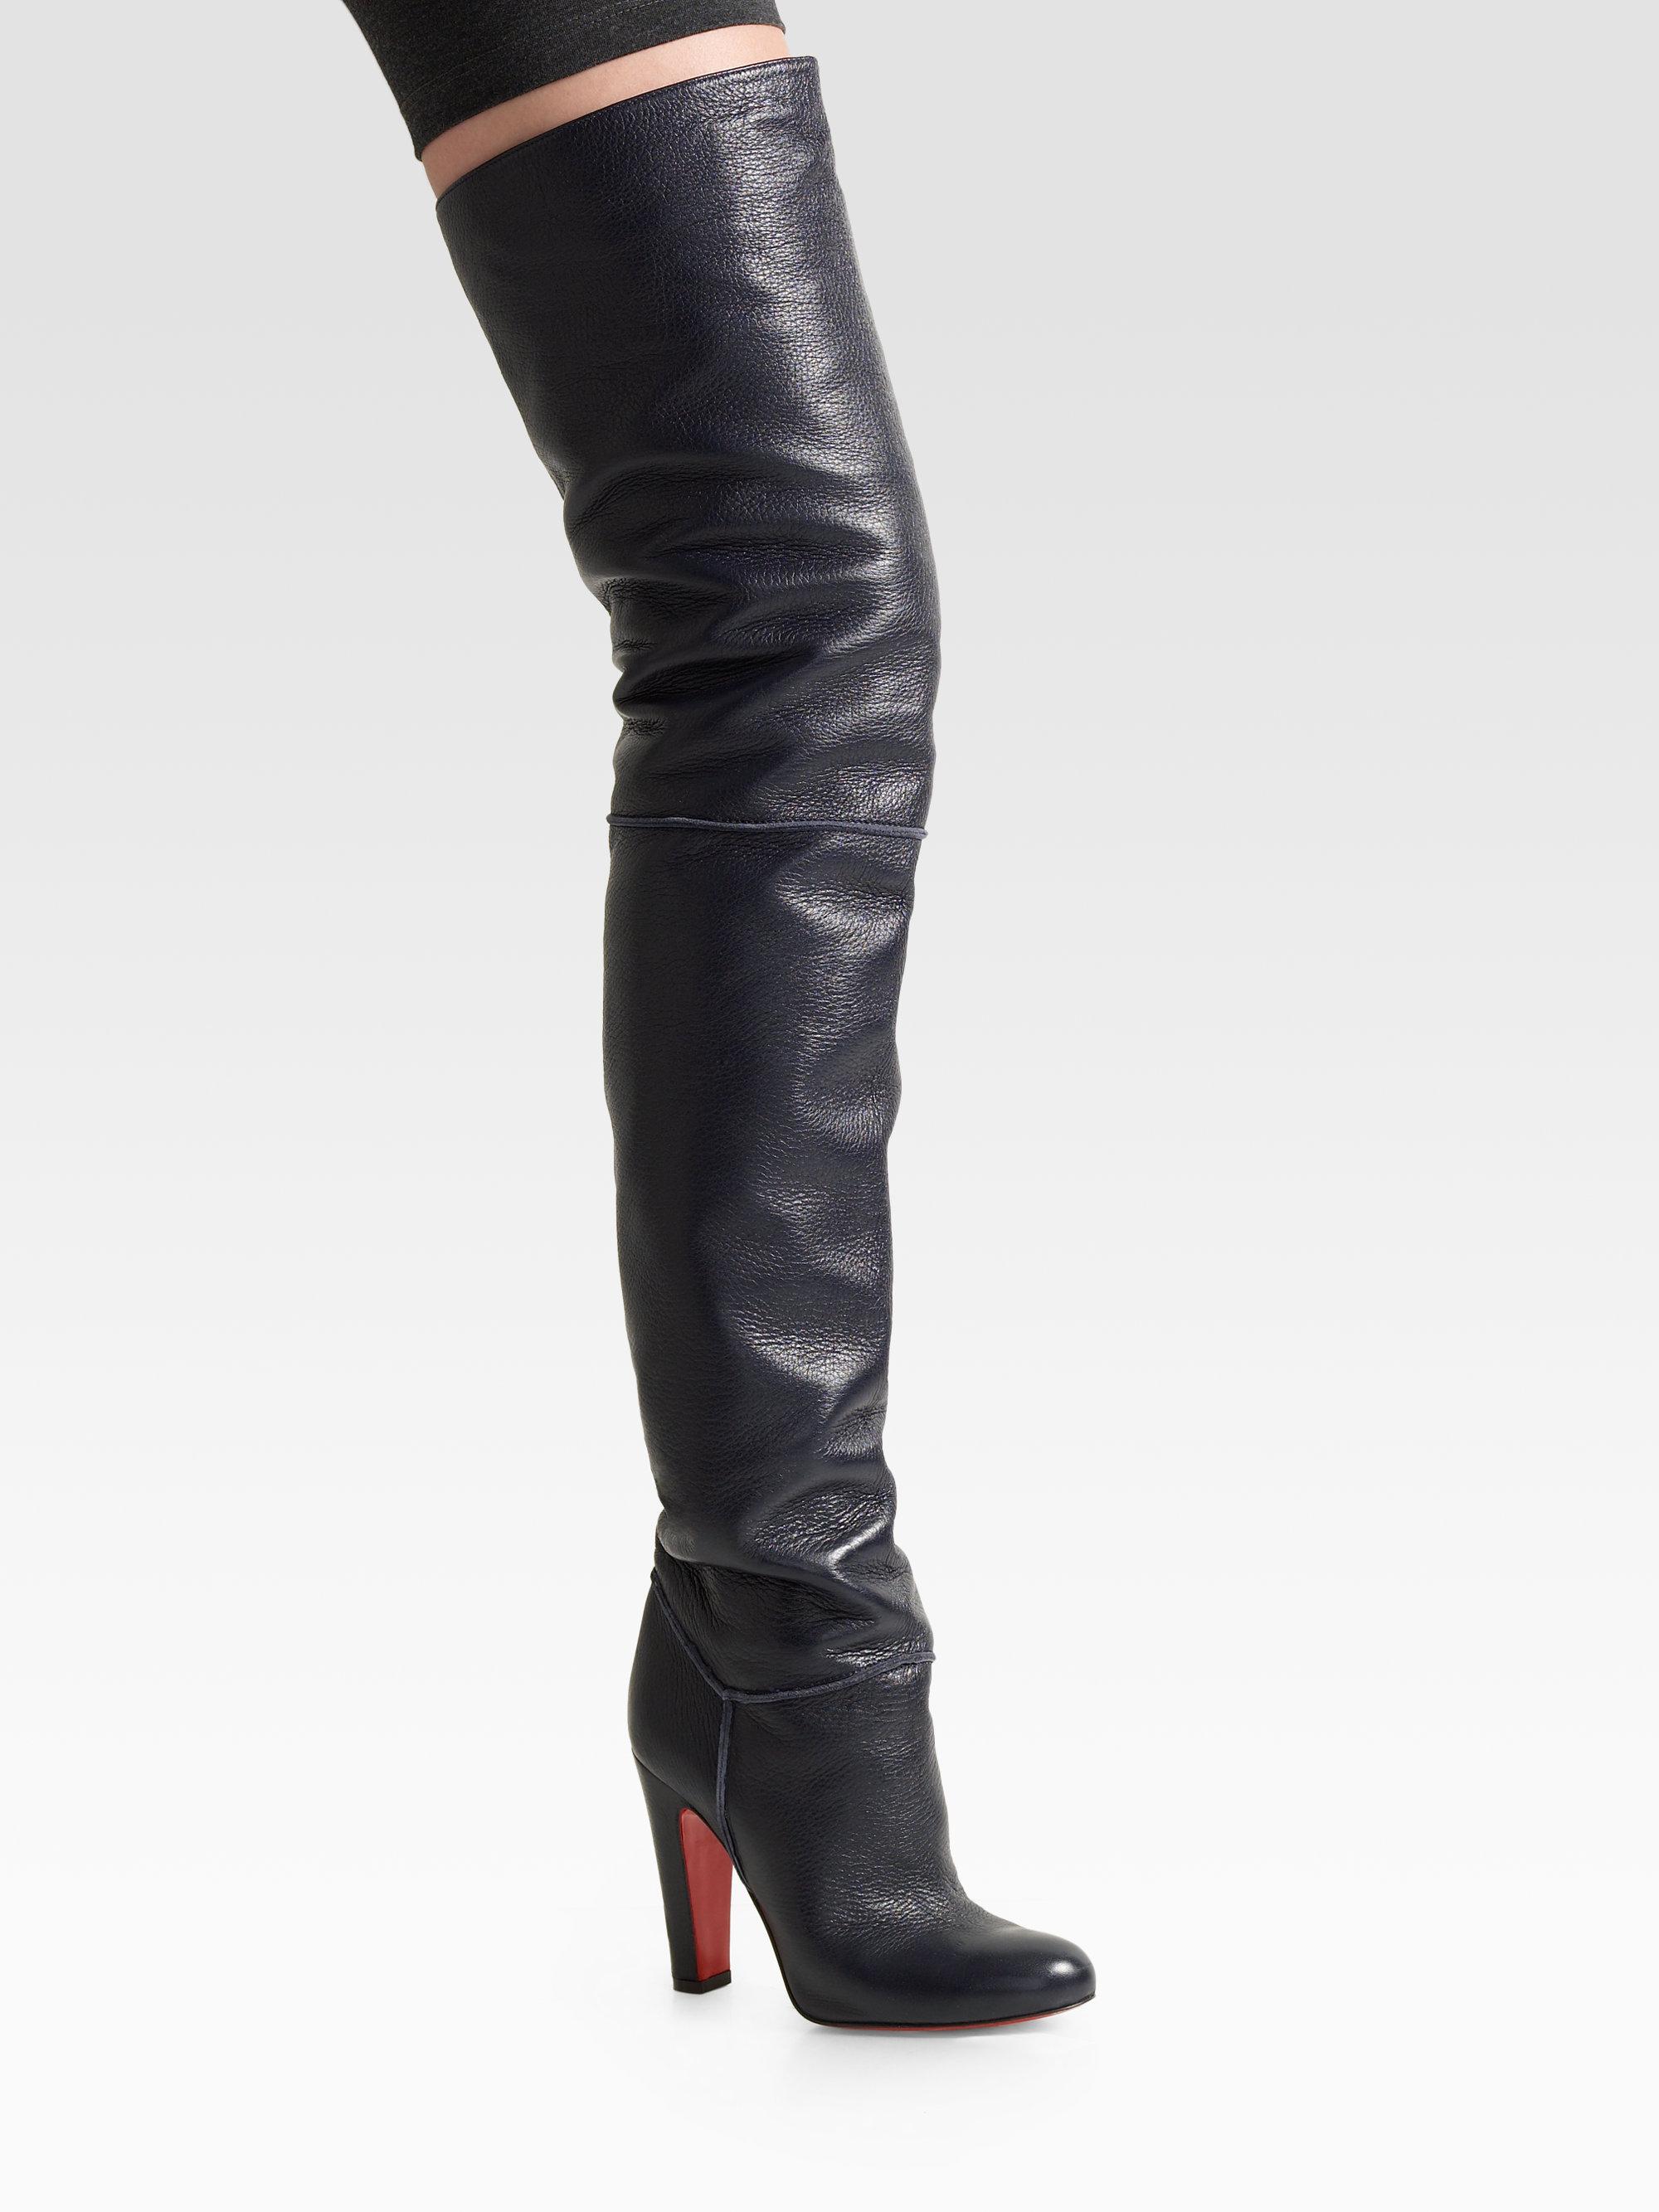 a6065a07afc Christian Louboutin Black Contente Overtheknee Boots